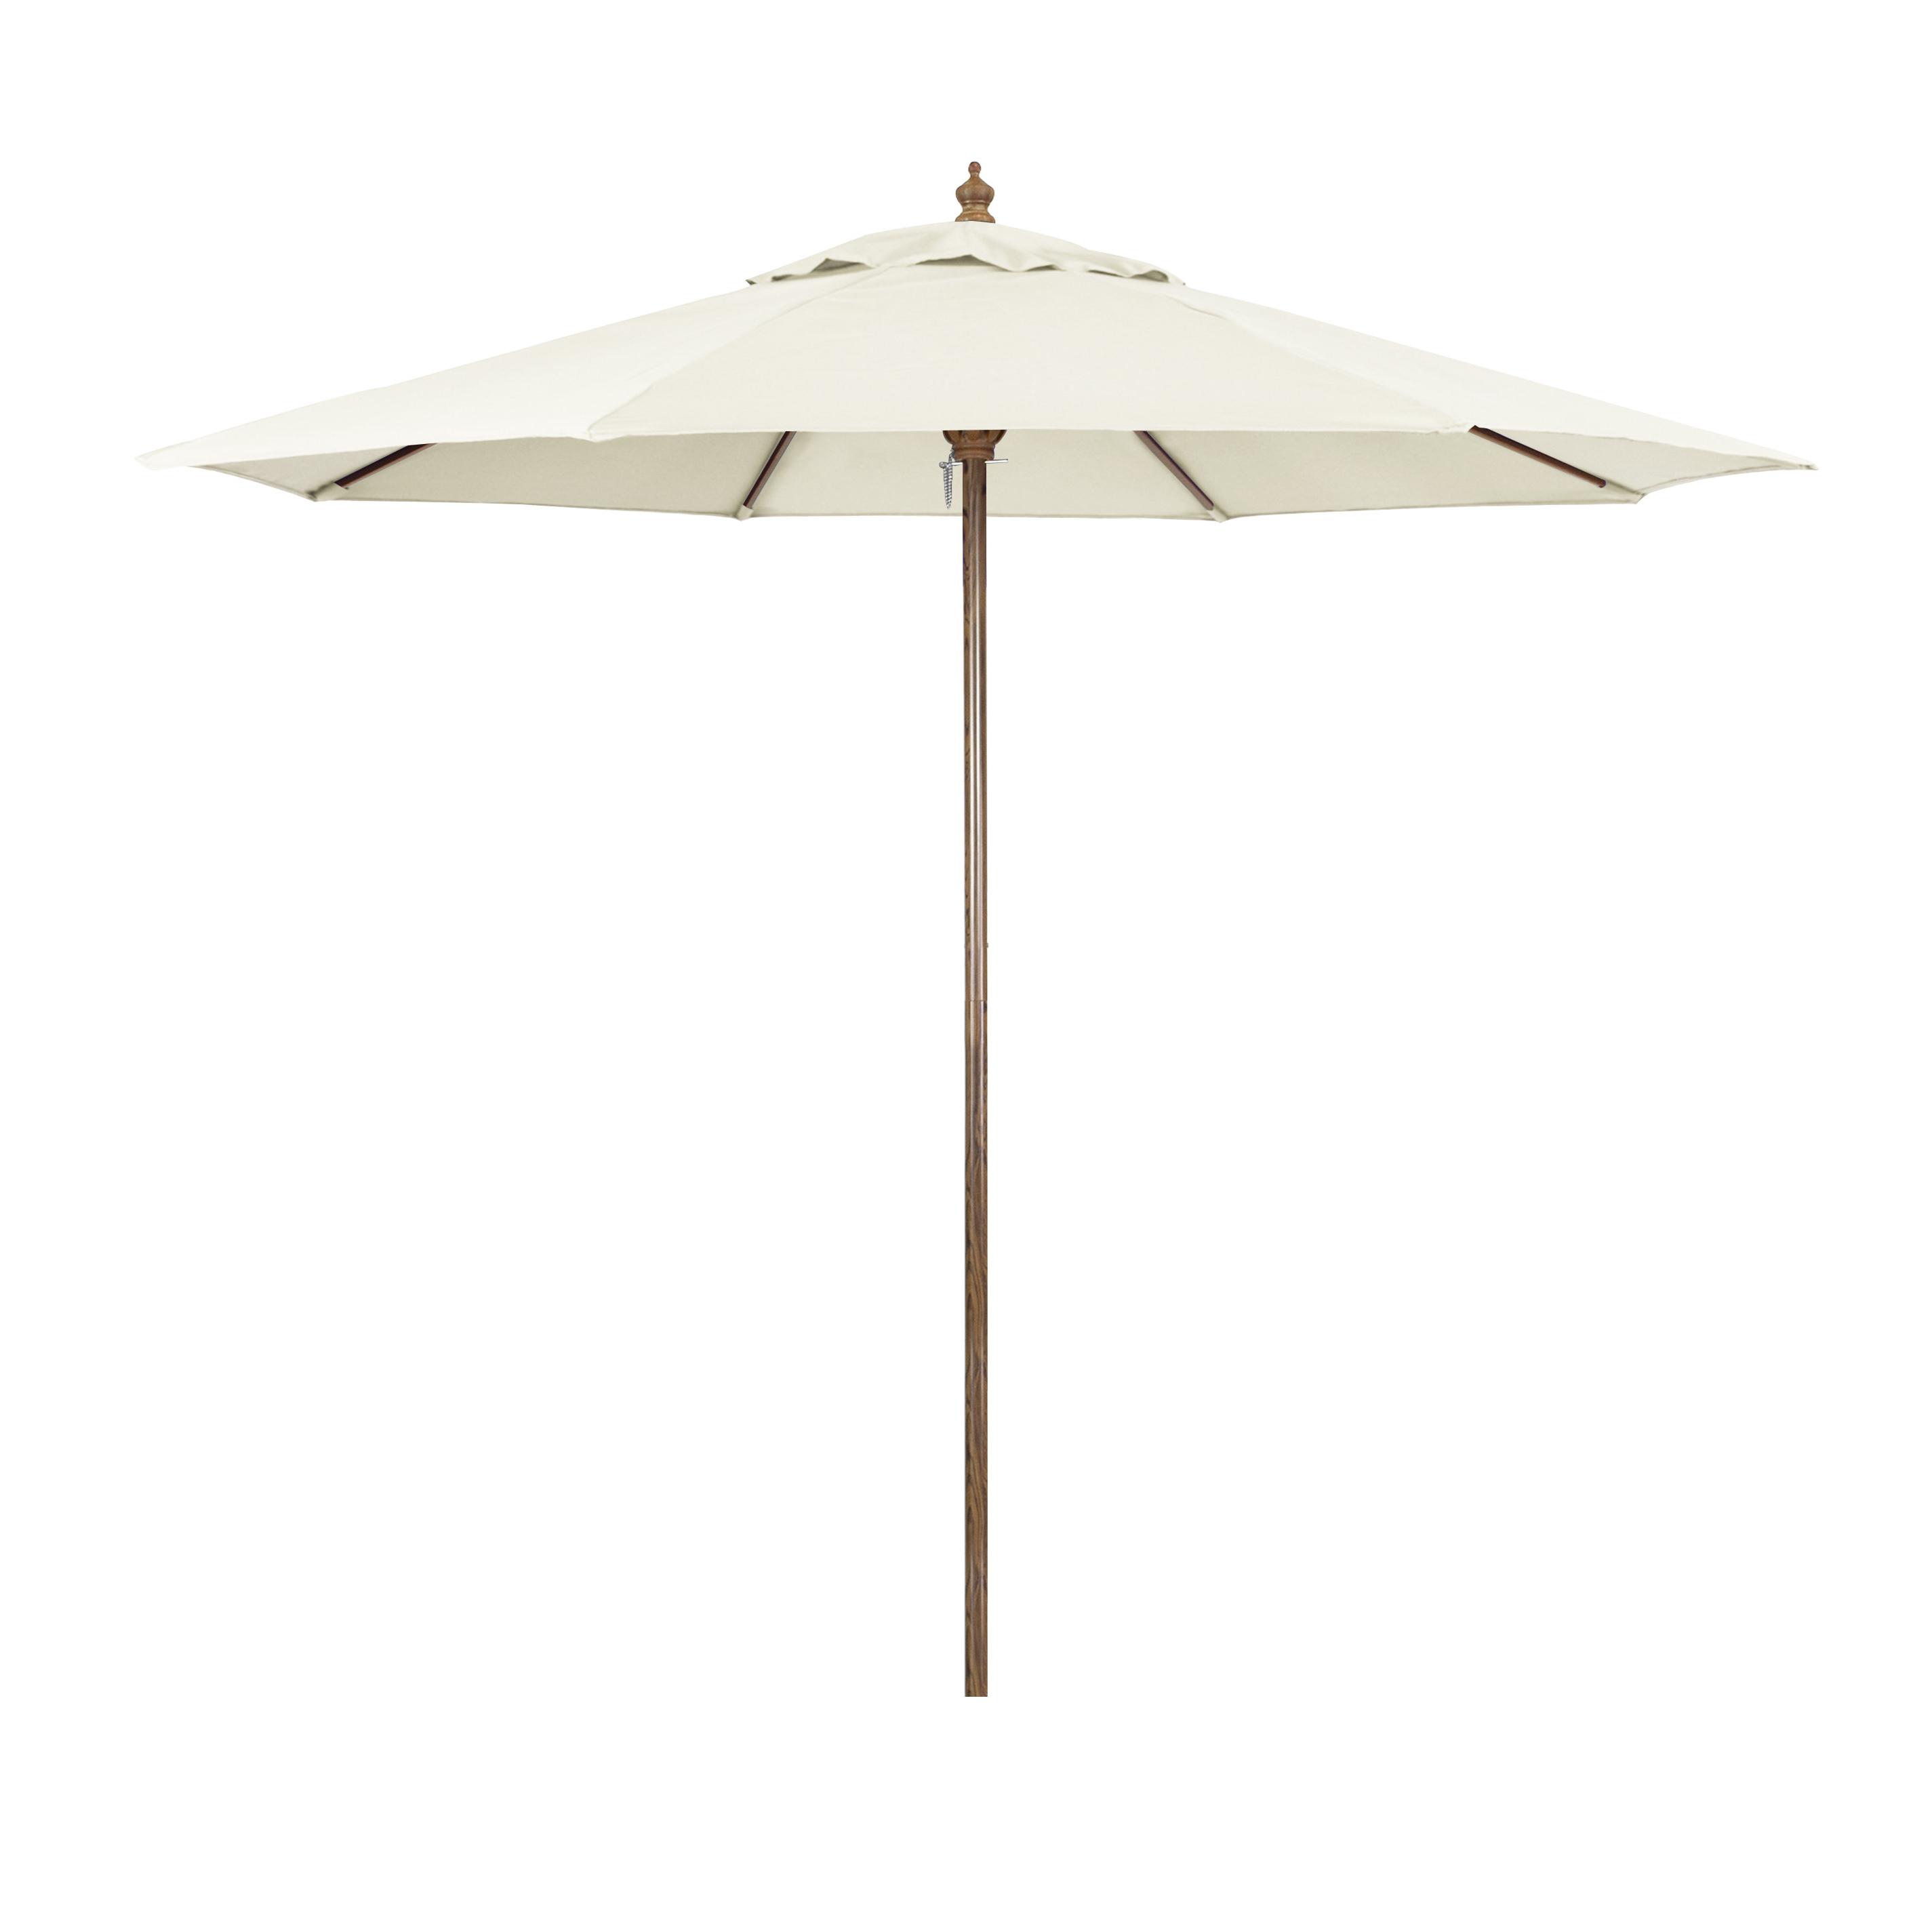 Favorite Kenn Market Umbrellas In Ryant 9' Market Umbrella (View 5 of 20)